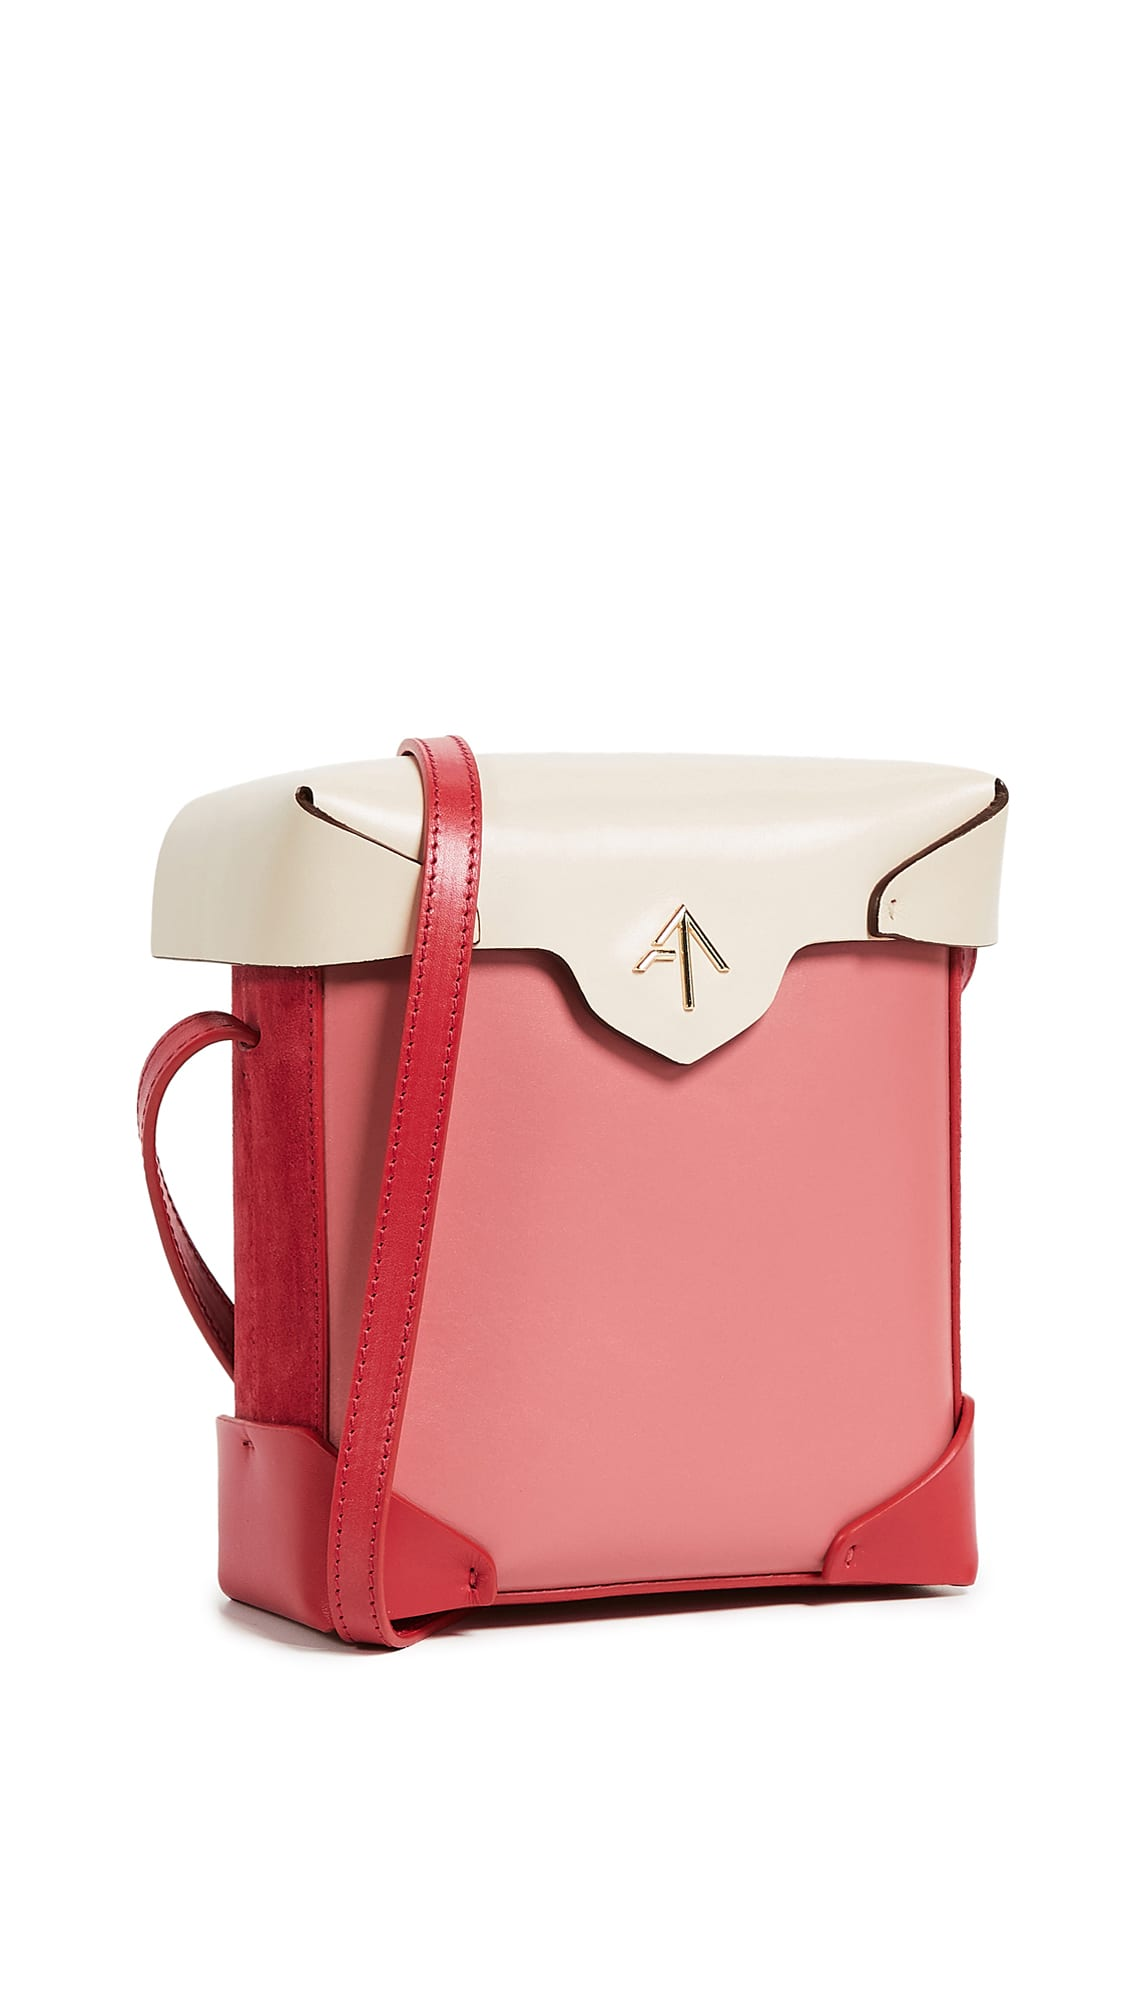 shopbop MANU Atelier Mini Pristine Combo Box Bag